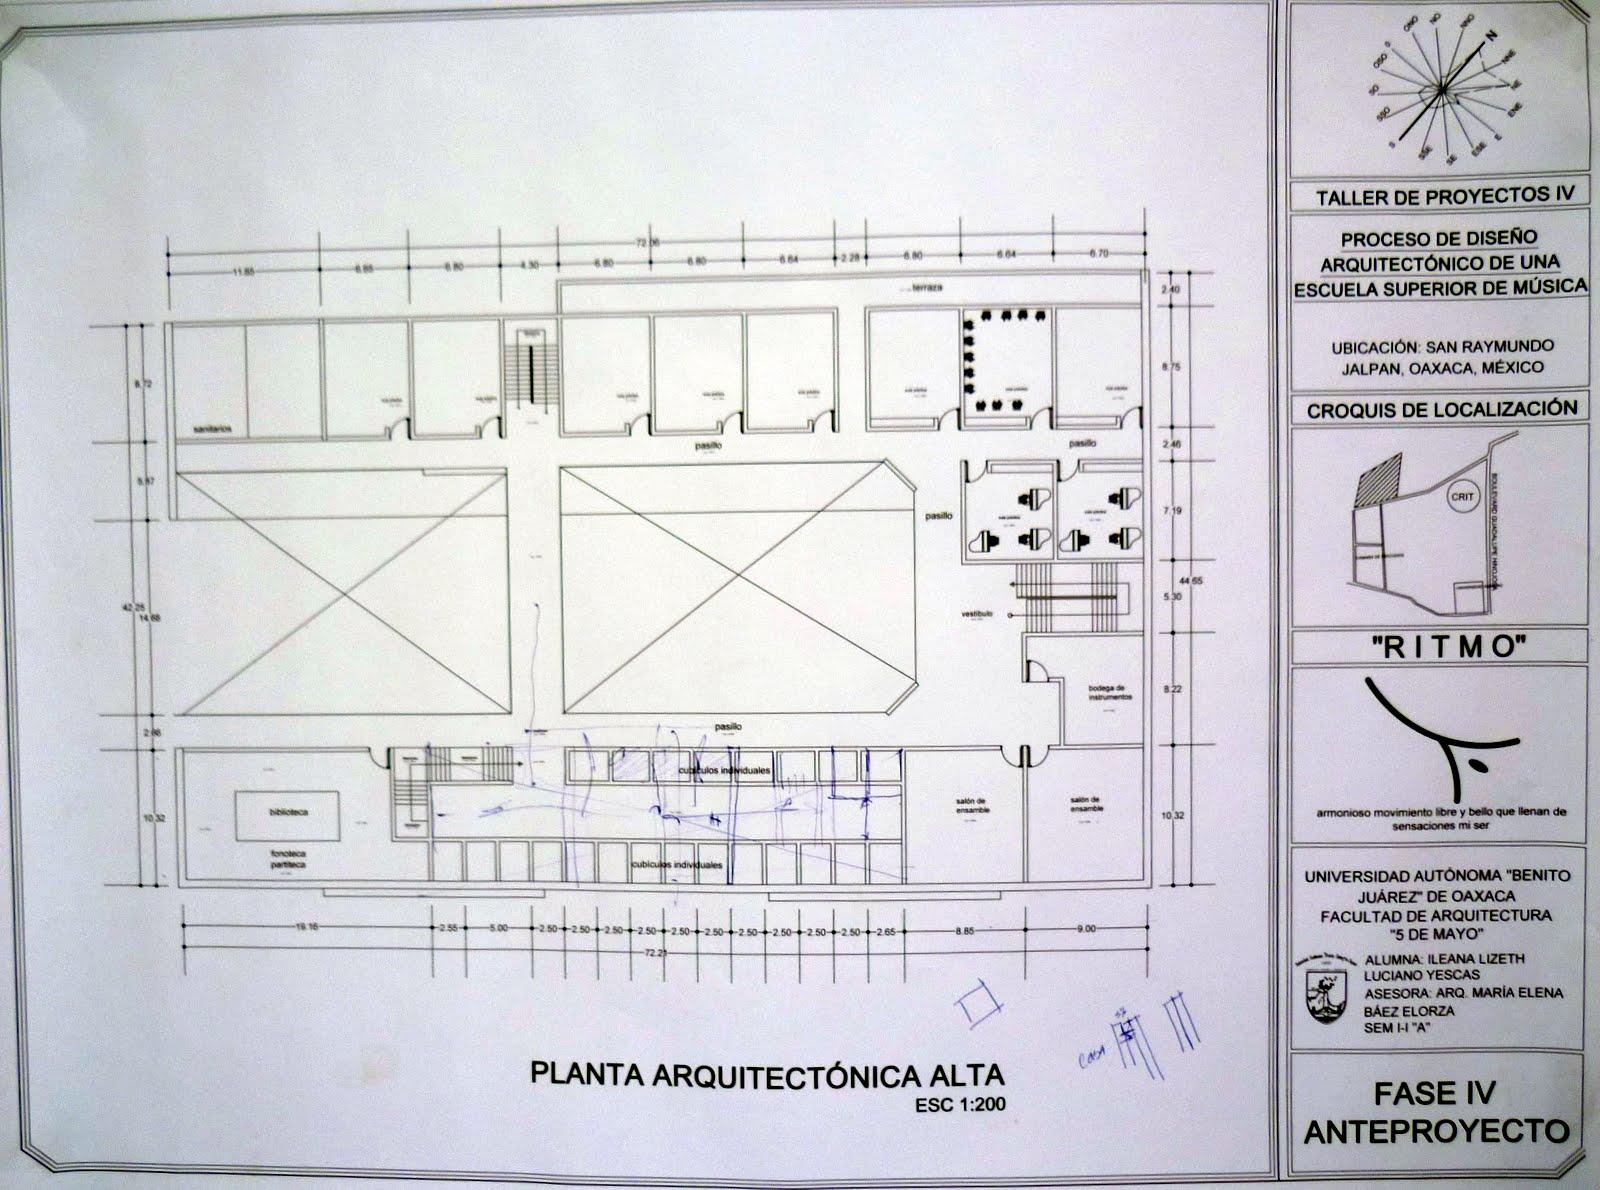 Fases de dise o primer propuesta de planta arquitect nica - Planta de salon ...